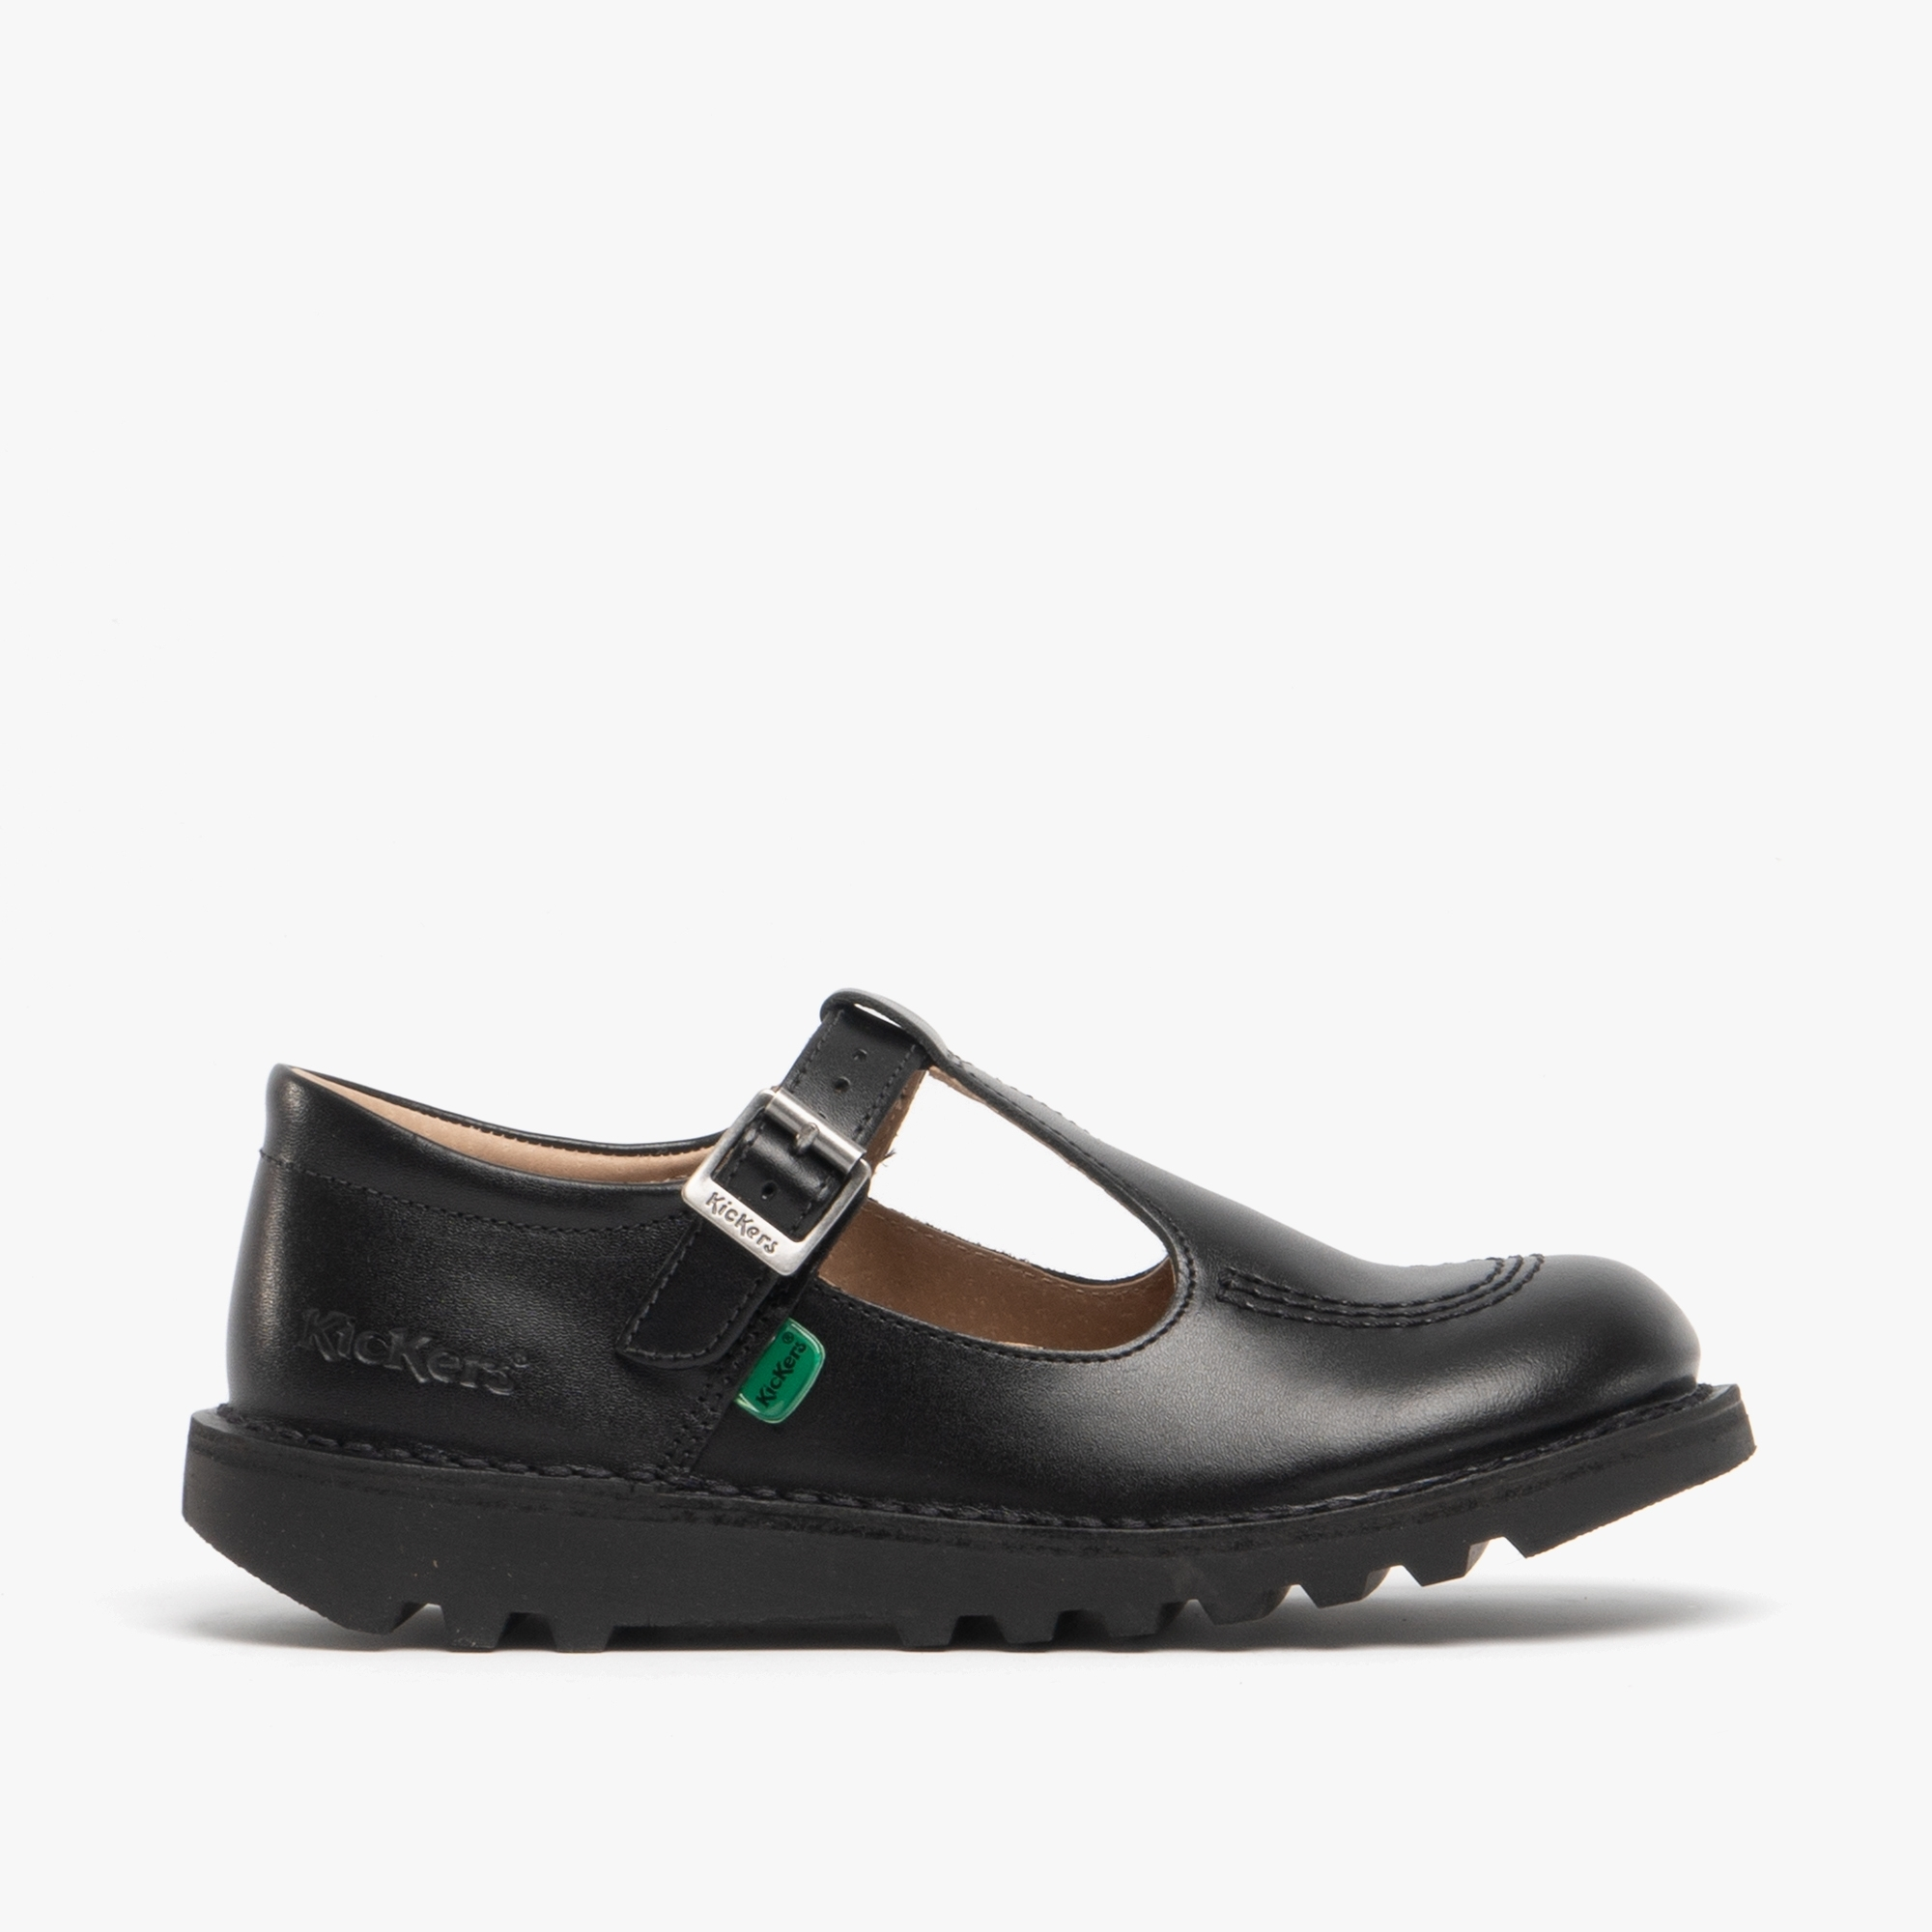 Bar Leather Shoes Black | SchoolShoes.co.uk